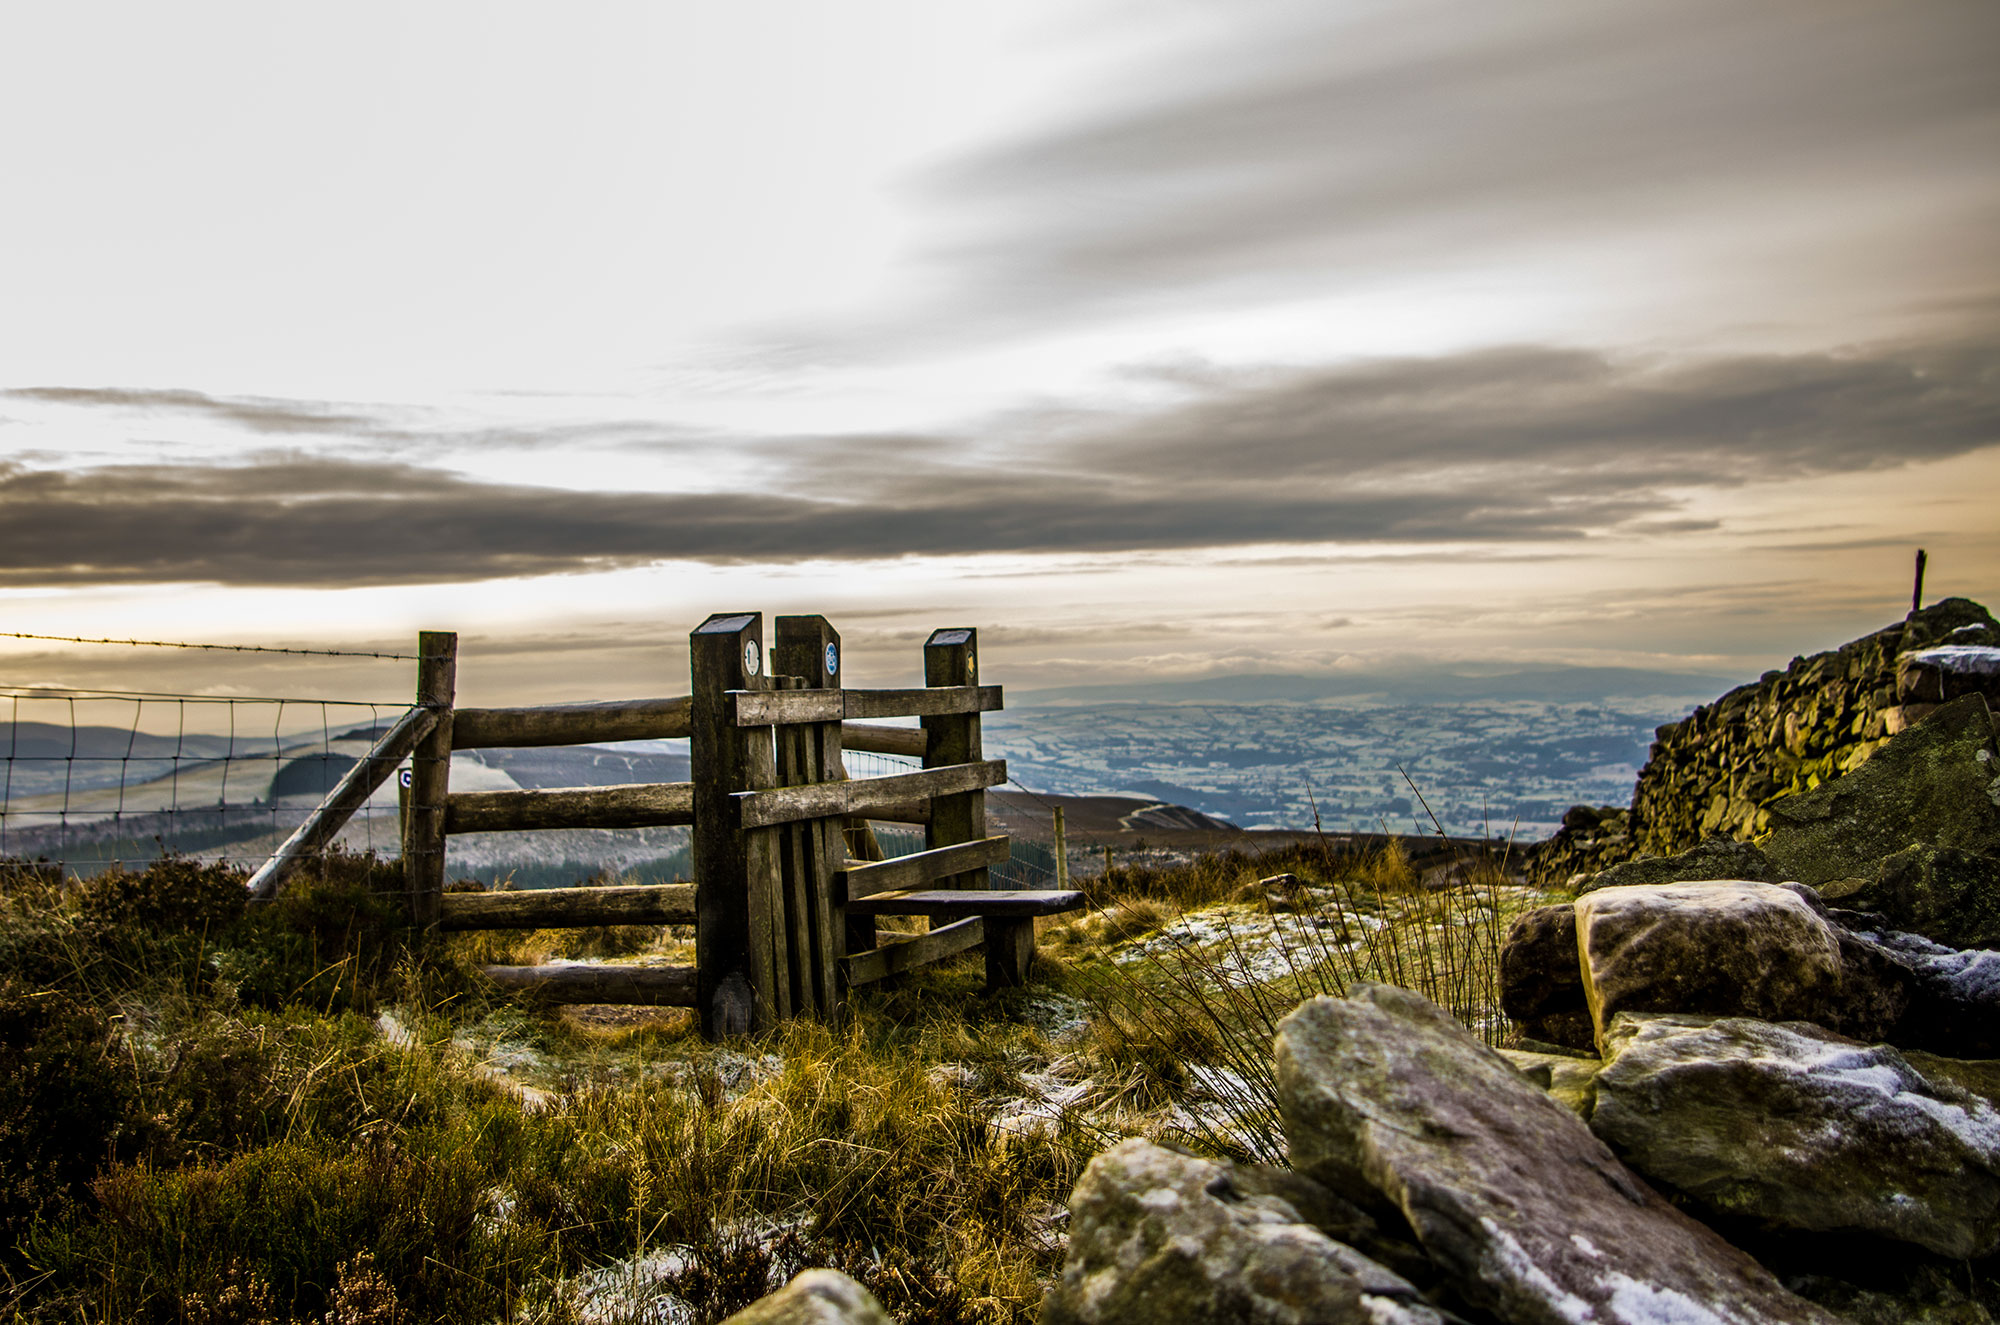 *Oak stile on Moel Famau with Vale of Clwyd in distance